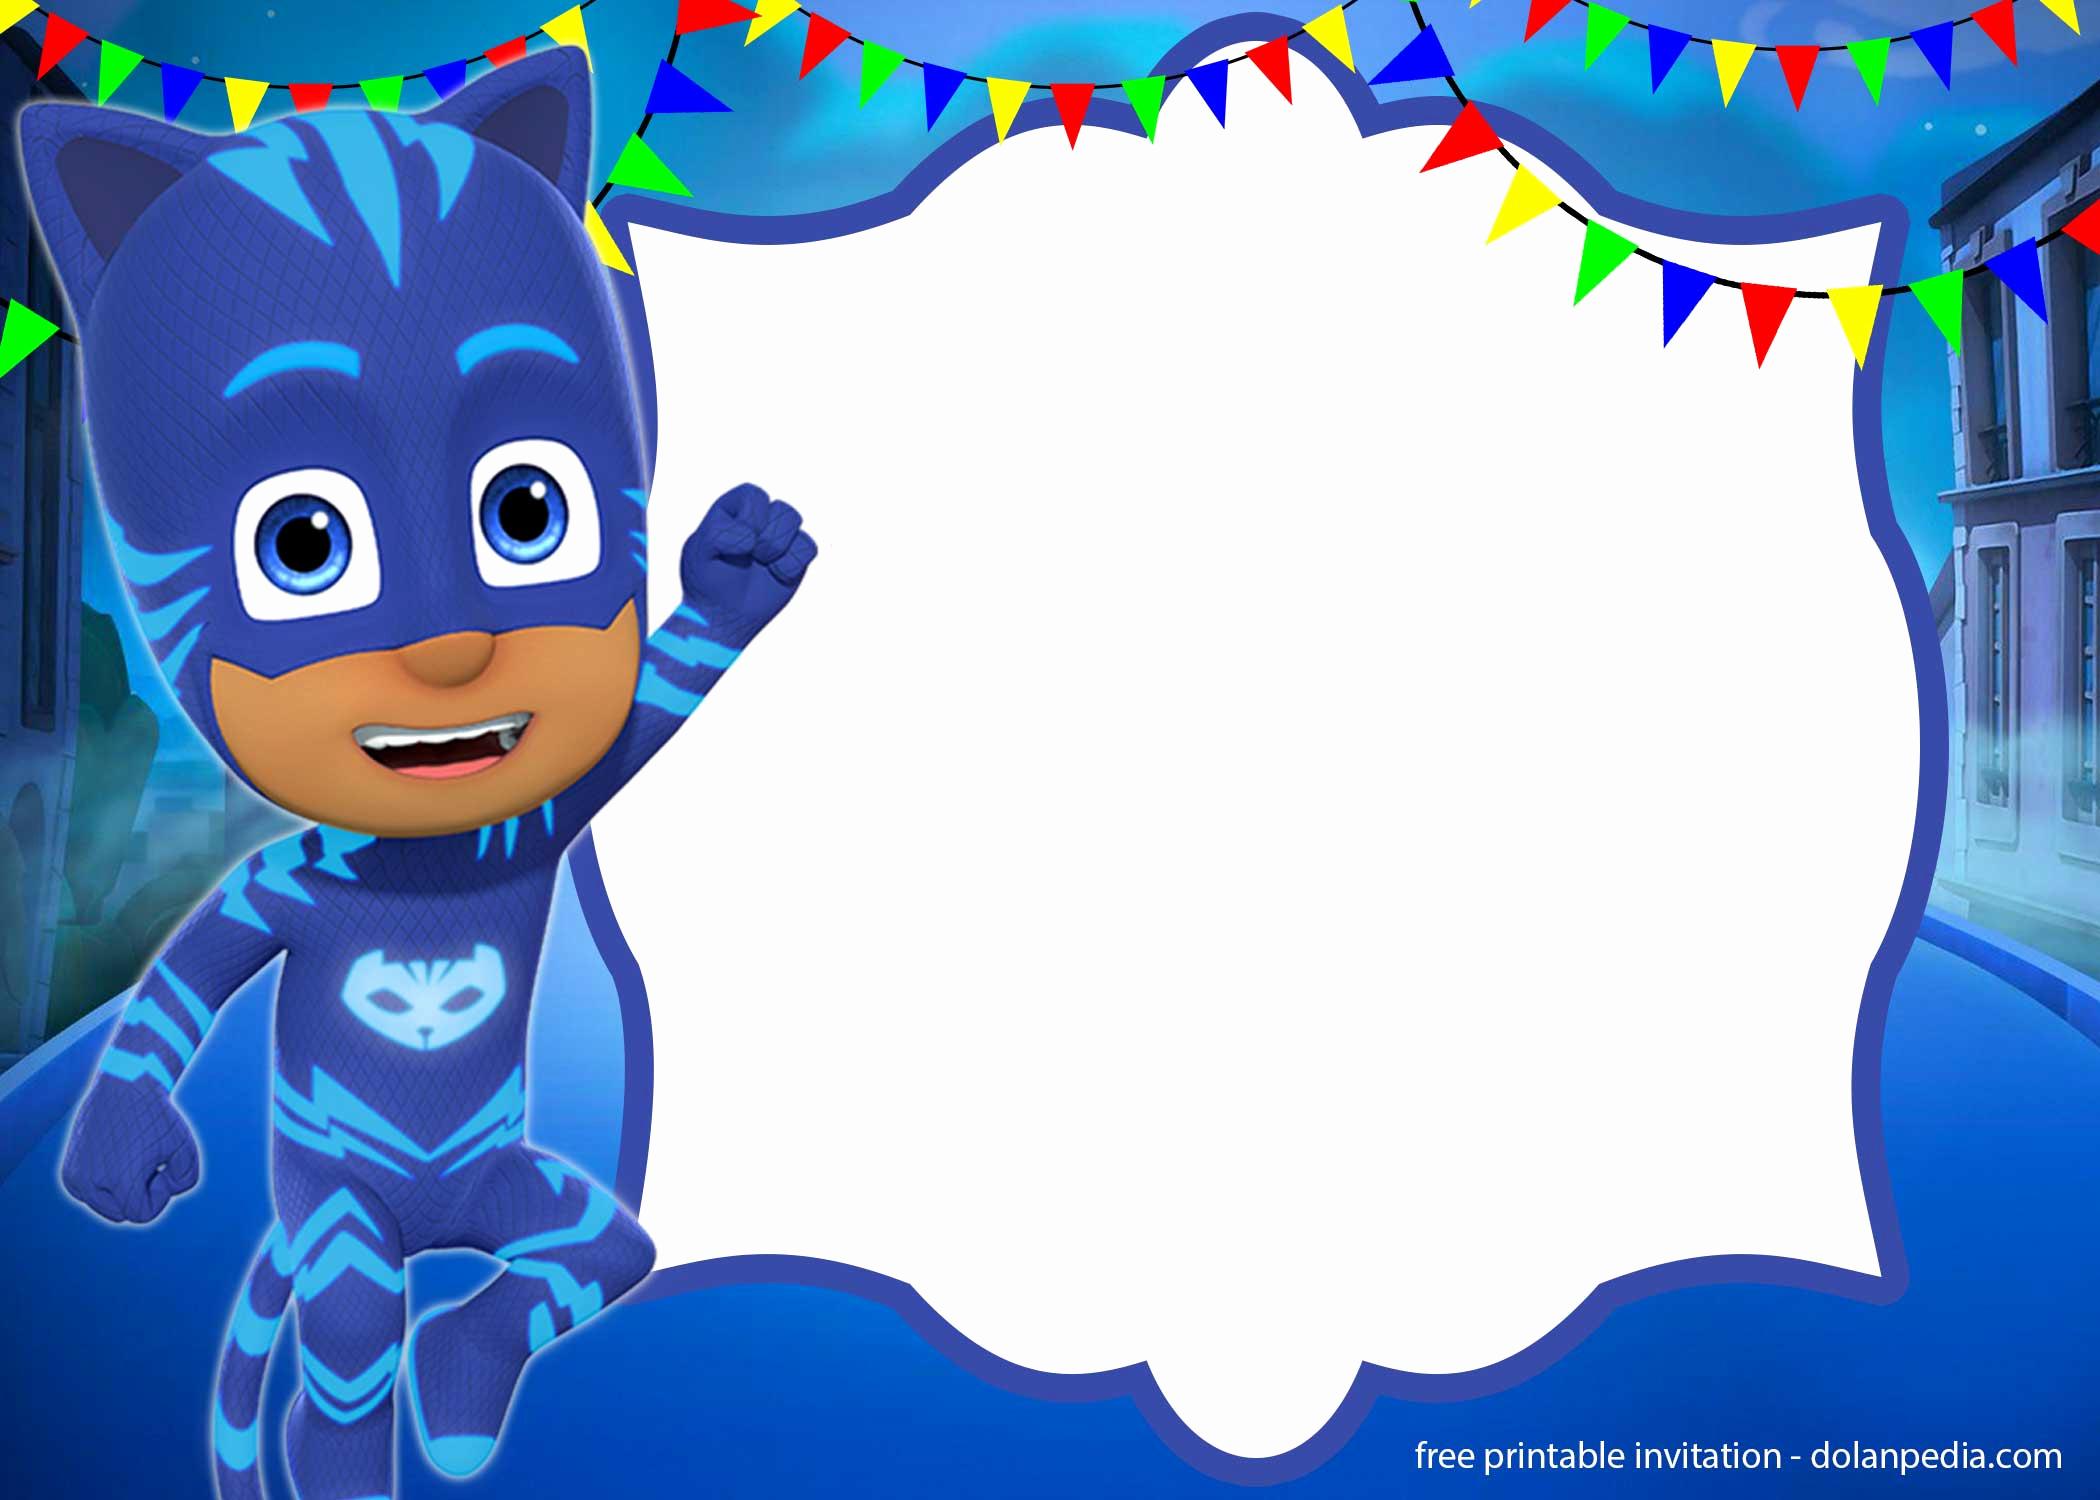 Pj Mask Birthday Invitation Template Beautiful 9 Free Pj Masks Birthday Invitation Templates – Updated